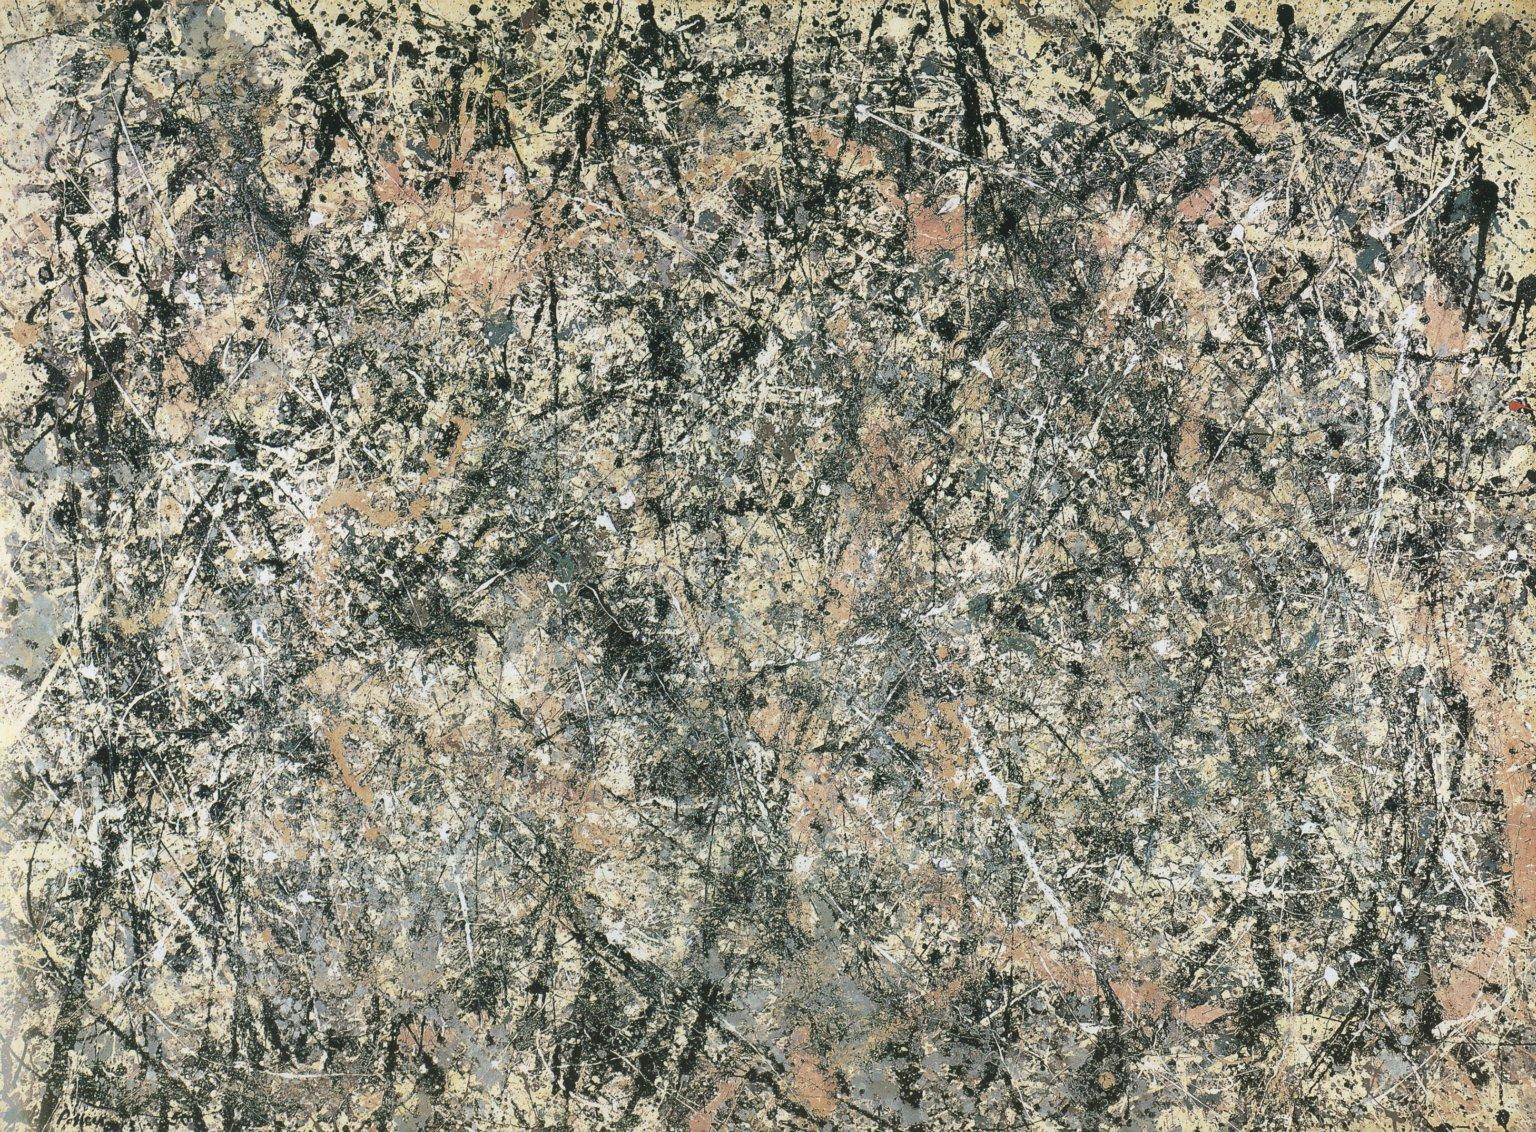 Number 1 (Laven... Jackson Pollock Number 10 1949